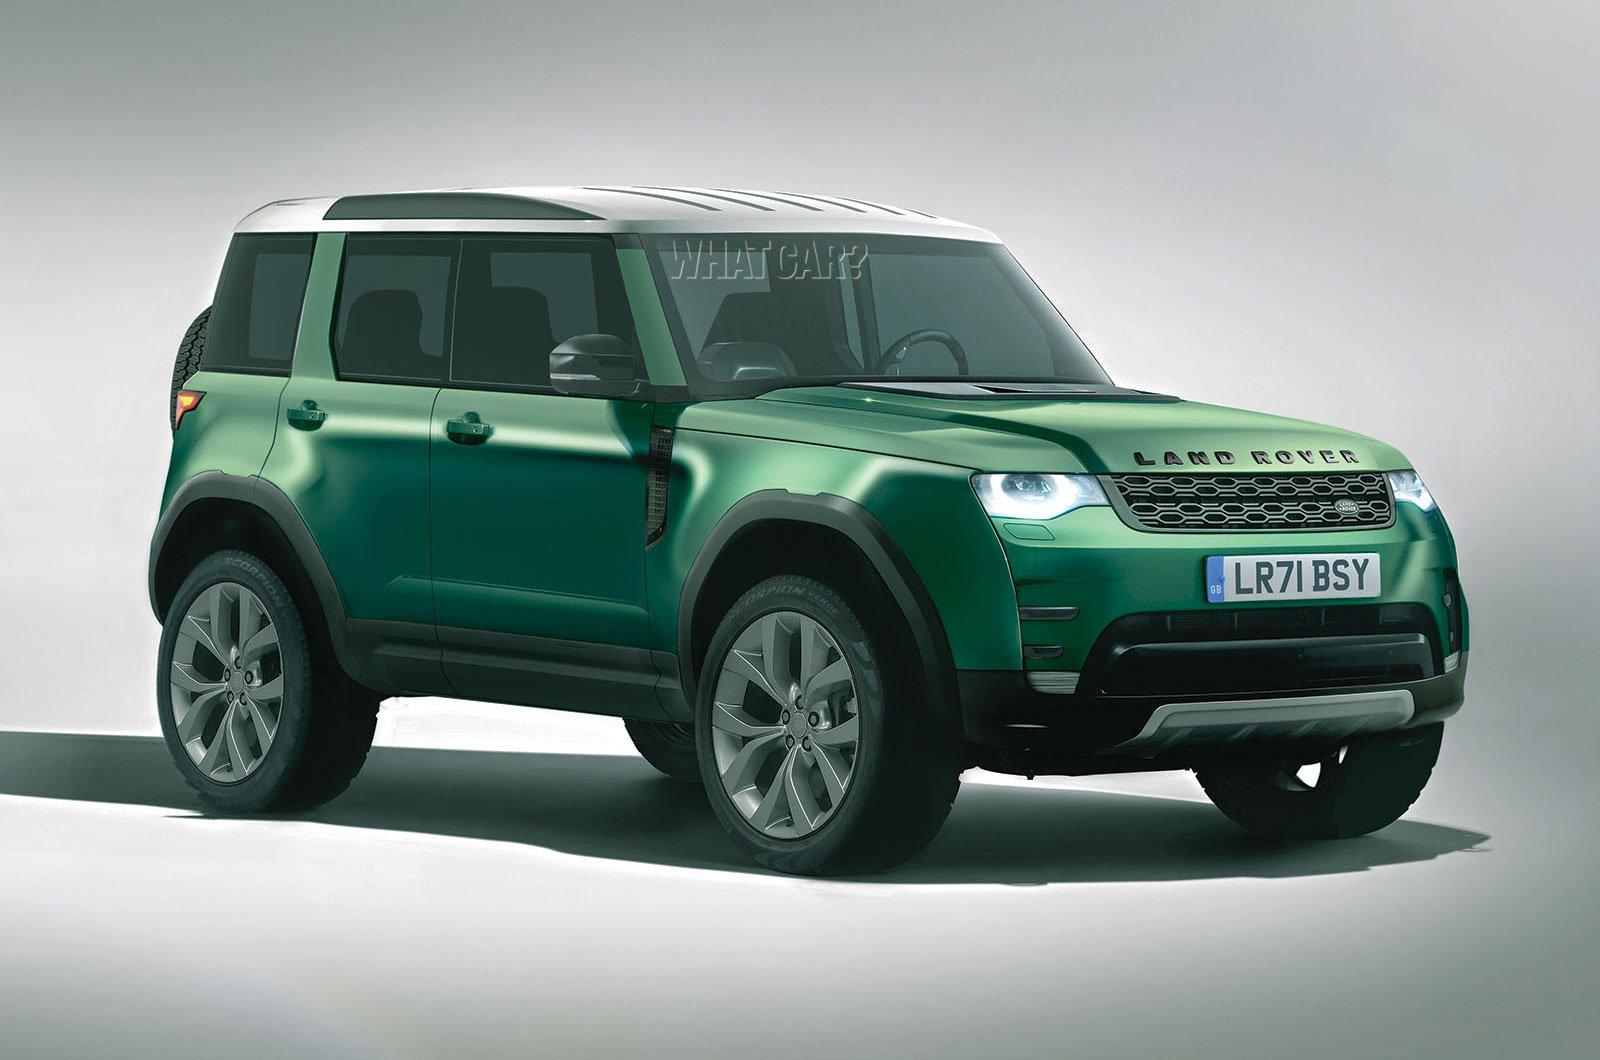 Land Rover Baby Defender rendering